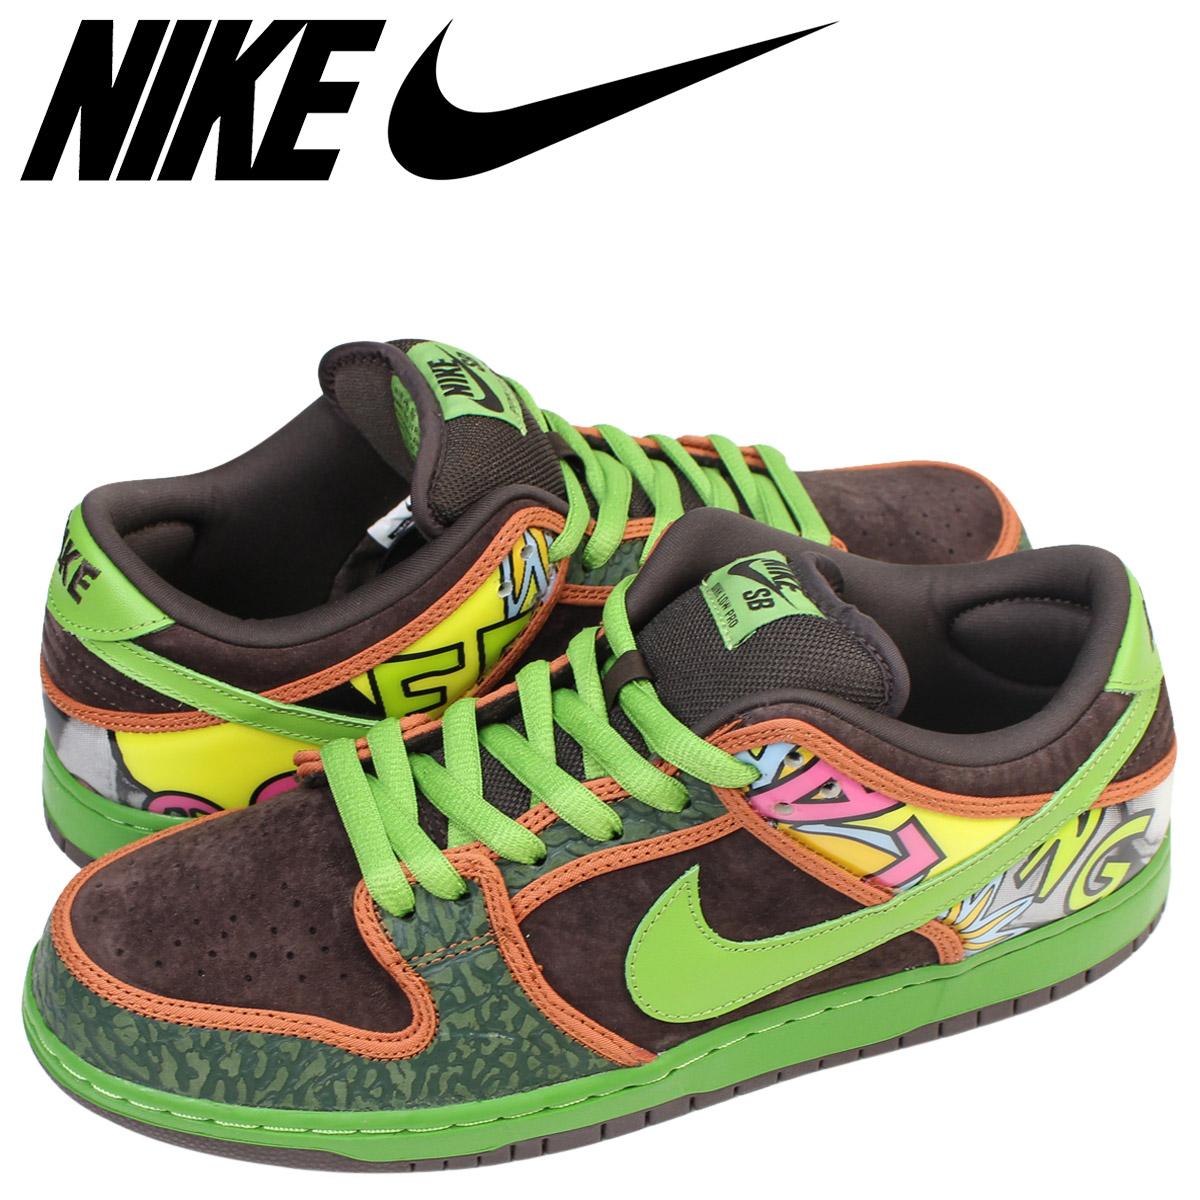 Sugar Online Shop  Nike NIKE SB dunk low sneakers DUNK LOW PREMIUM men  789 165a5c579de3